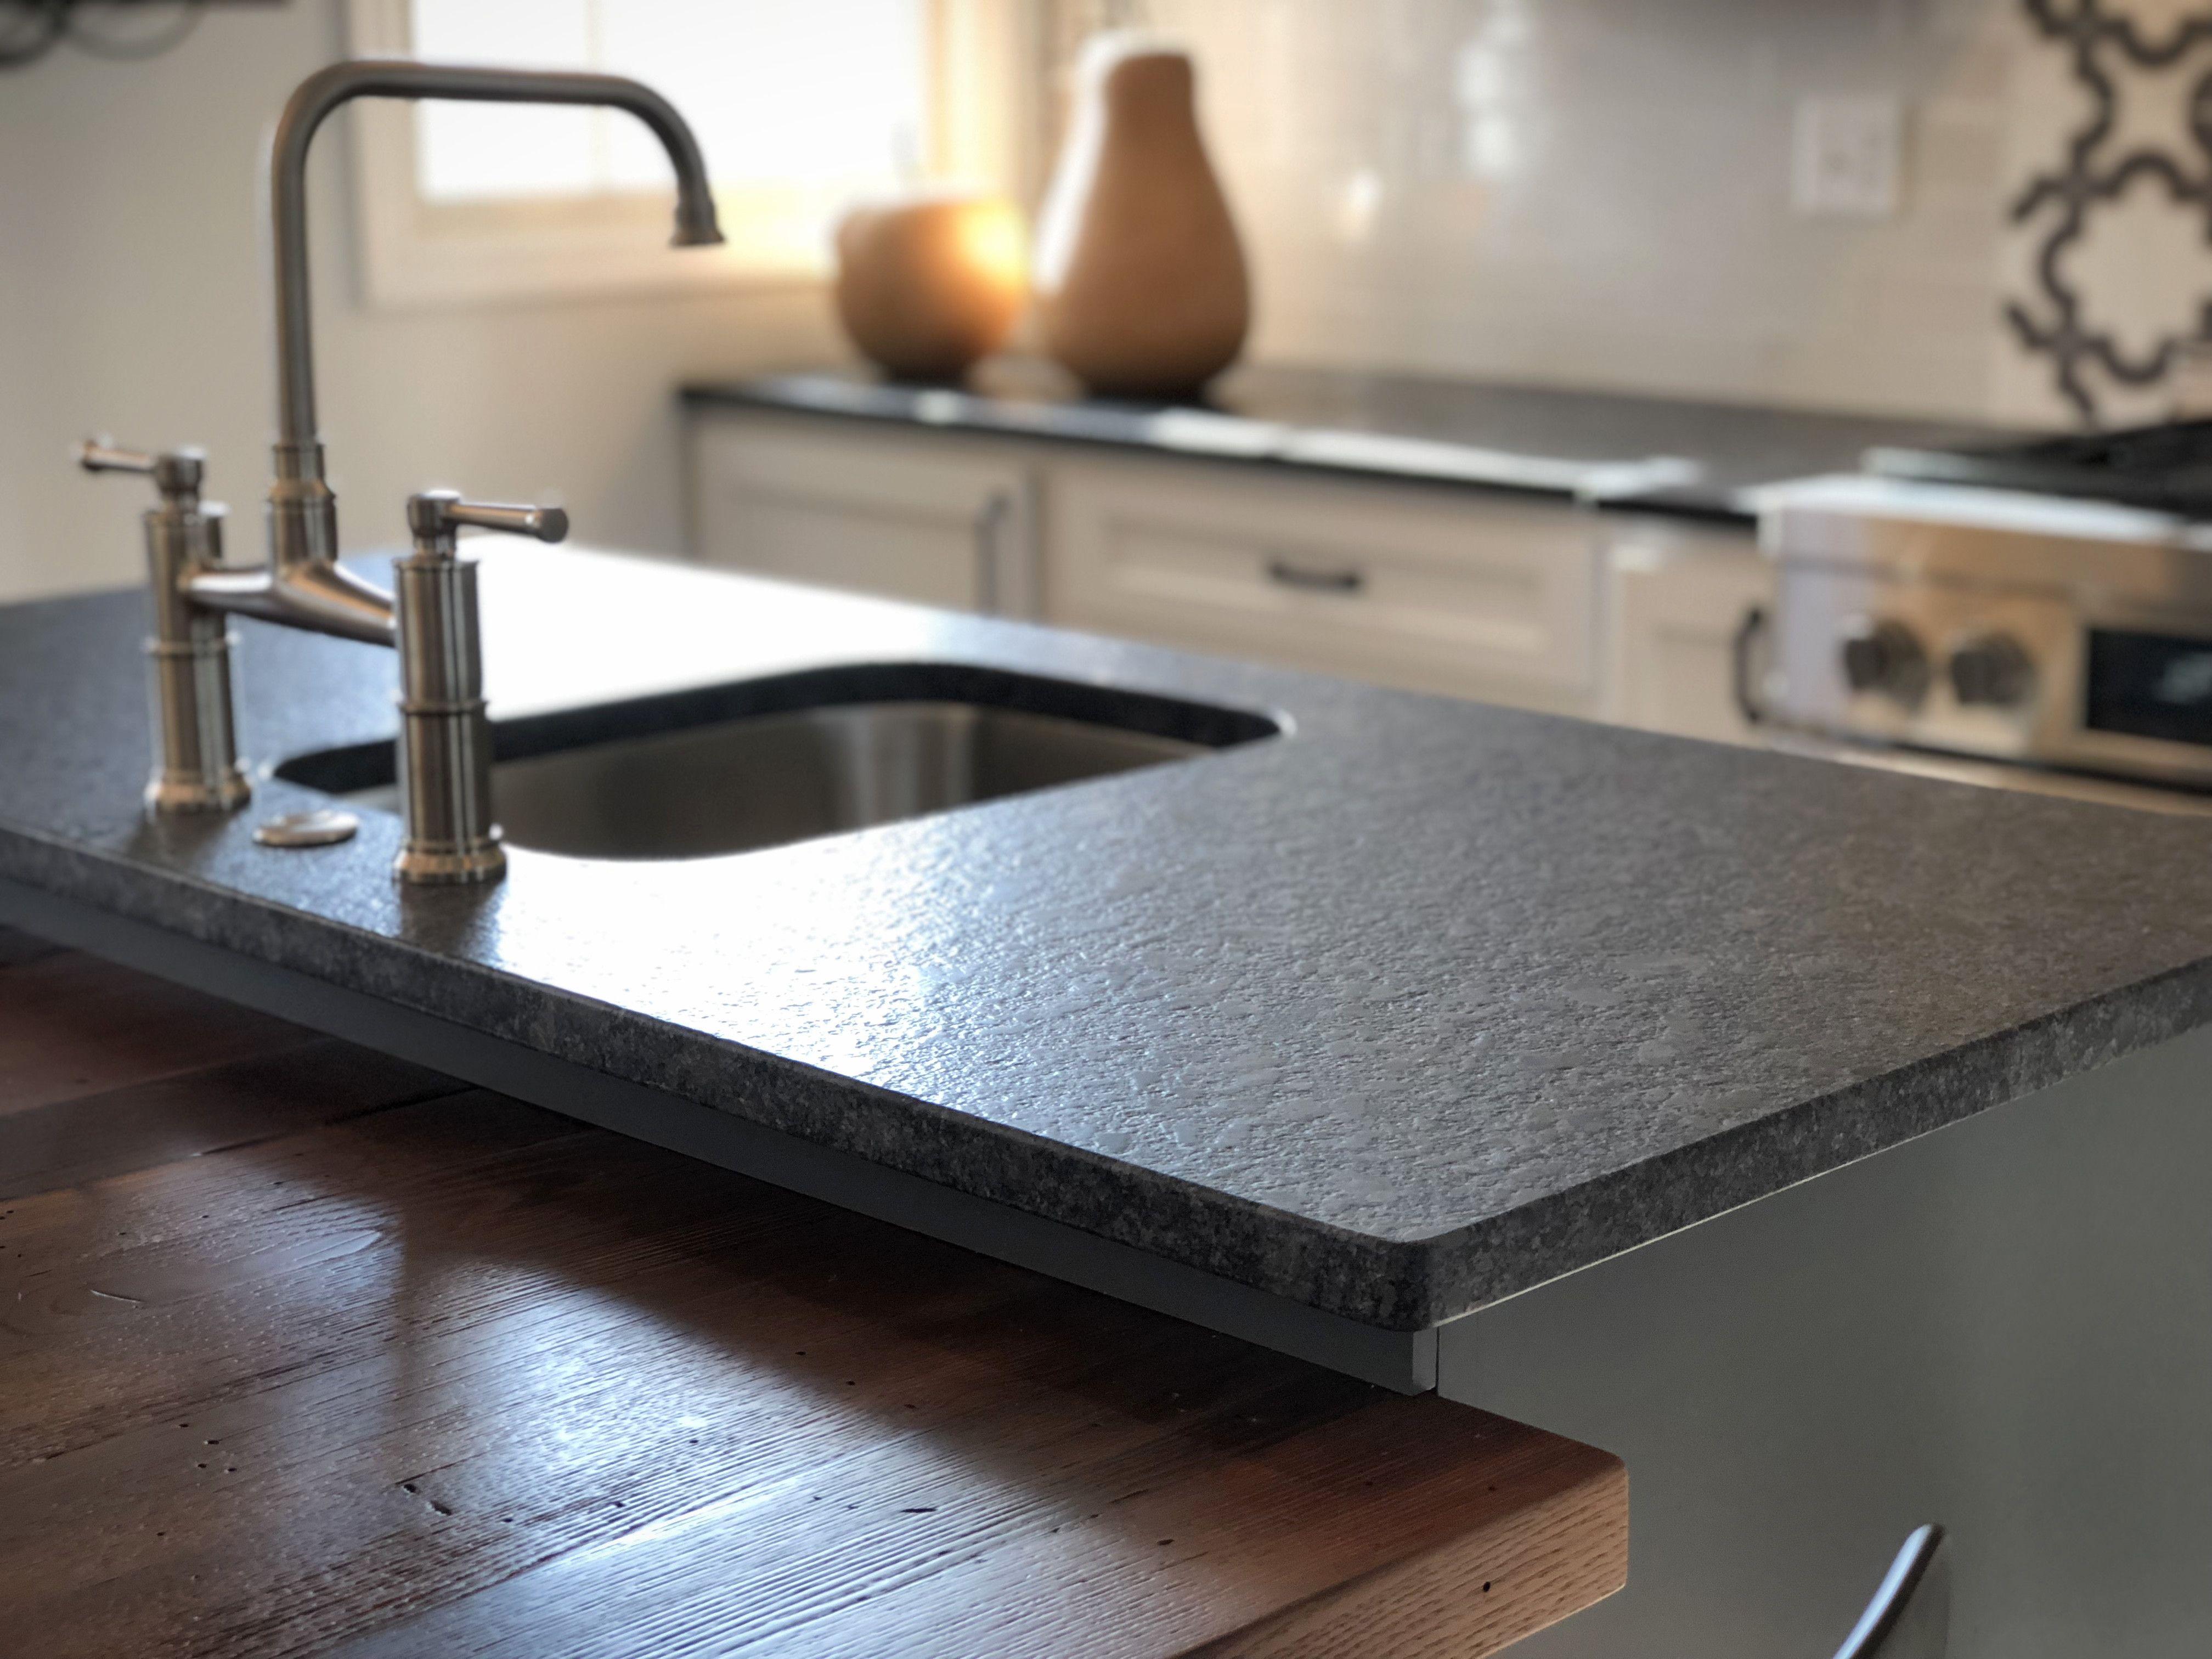 Steel Gray Leathered Granite Countertop